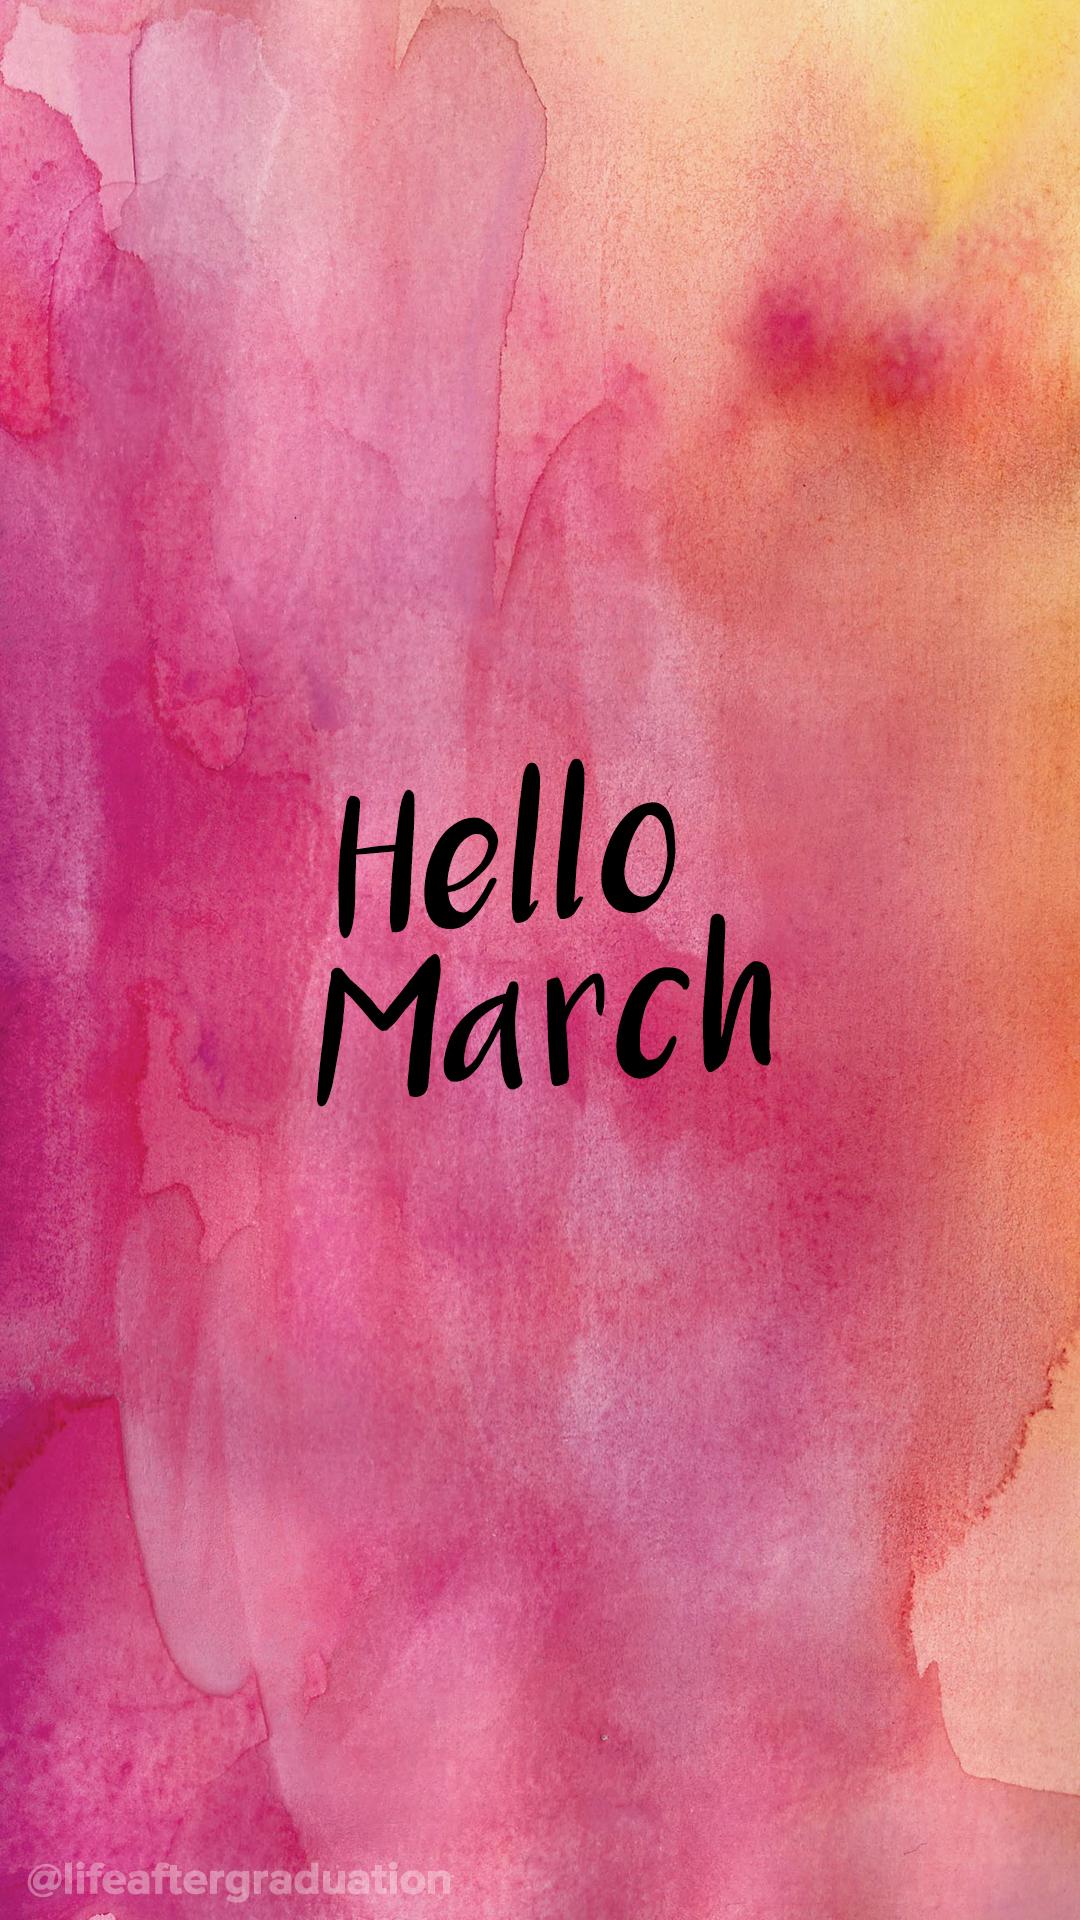 March5Ma